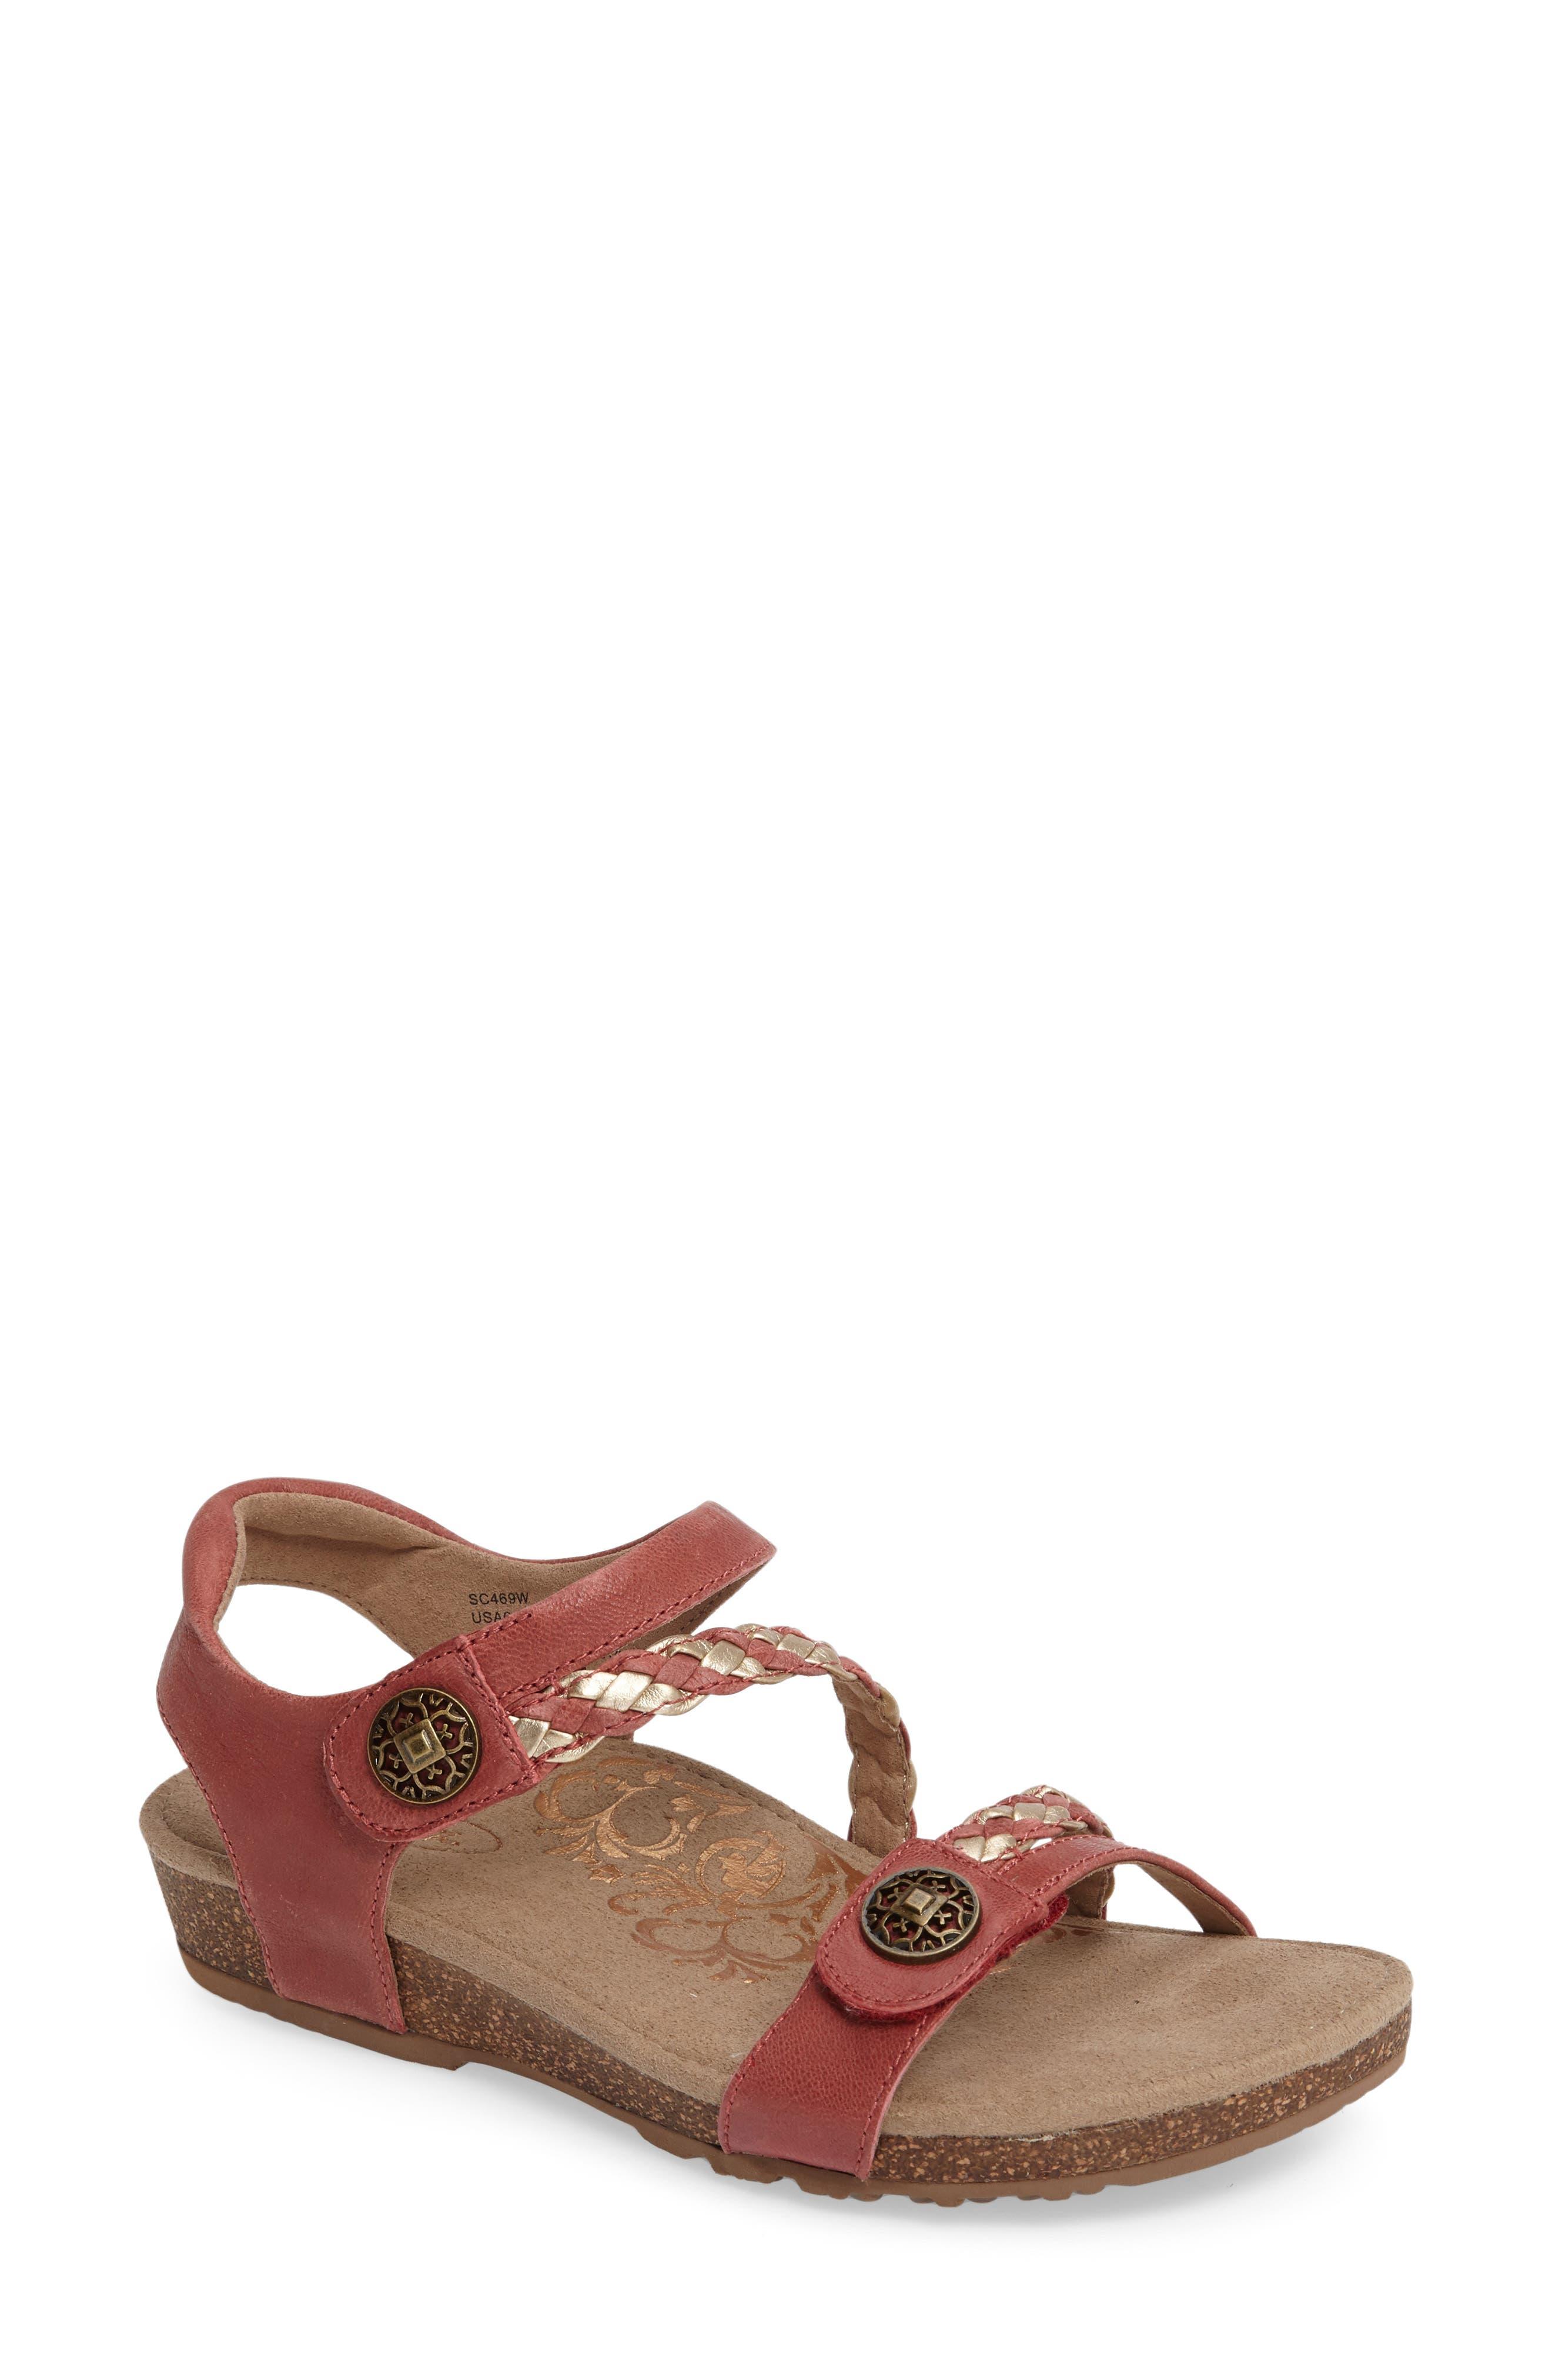 2bd404436c0 Aetrex  Jillian  Braided Leather Strap Sandal